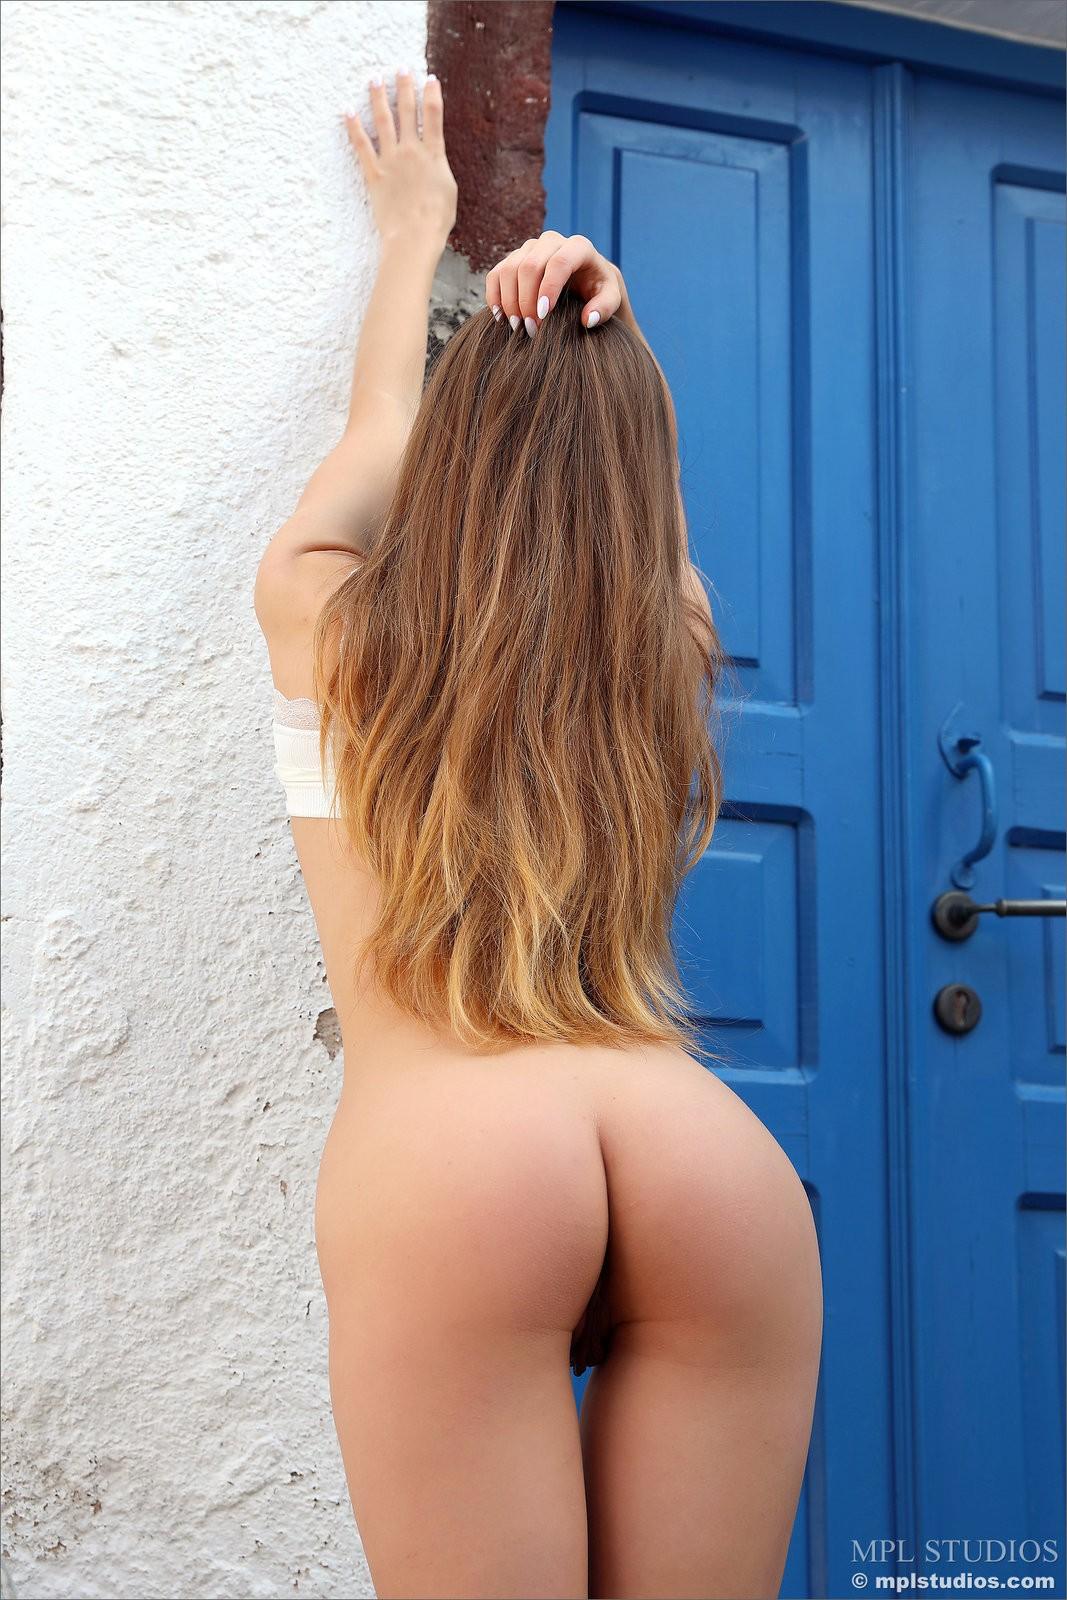 Девушка сняла юбку и оттопырила попку - фото